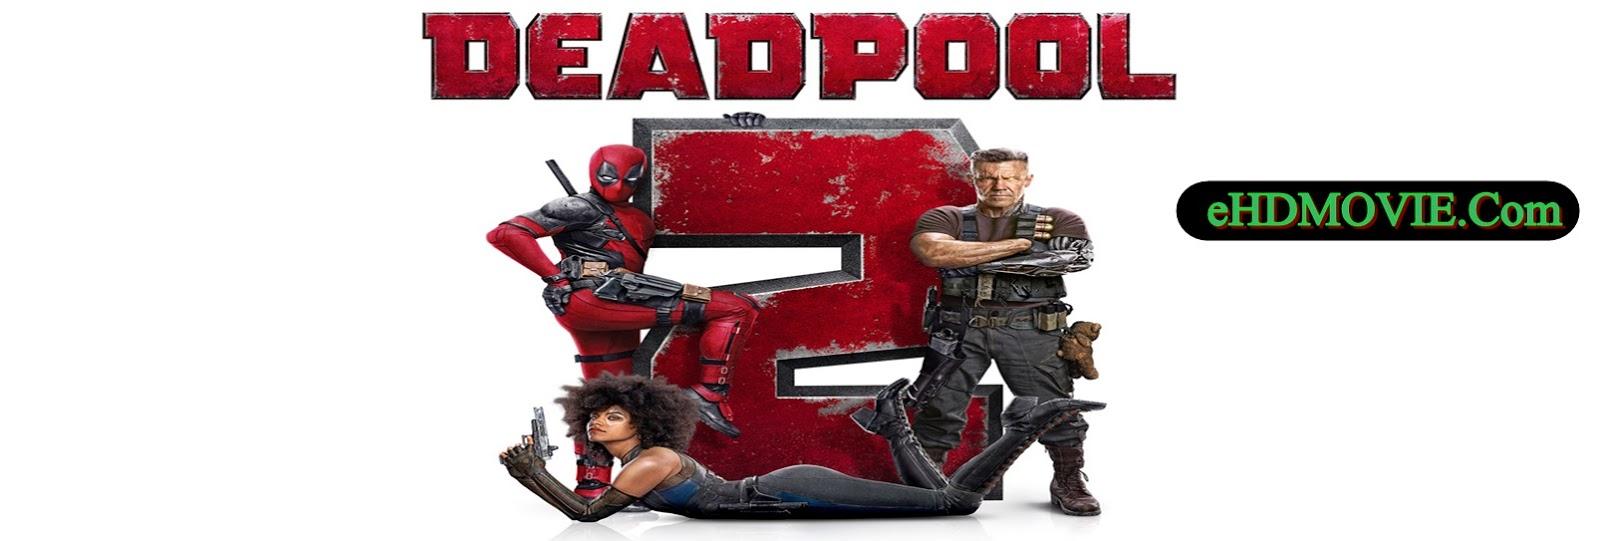 Deadpool 2 2018 Full Movie Dual Audio [Hindi – English] 1080p - 720p - HEVC - 480p ORG WEB-DL 250MB - 350MB - 550MB - 1GB - 2GB ESubs Free Download